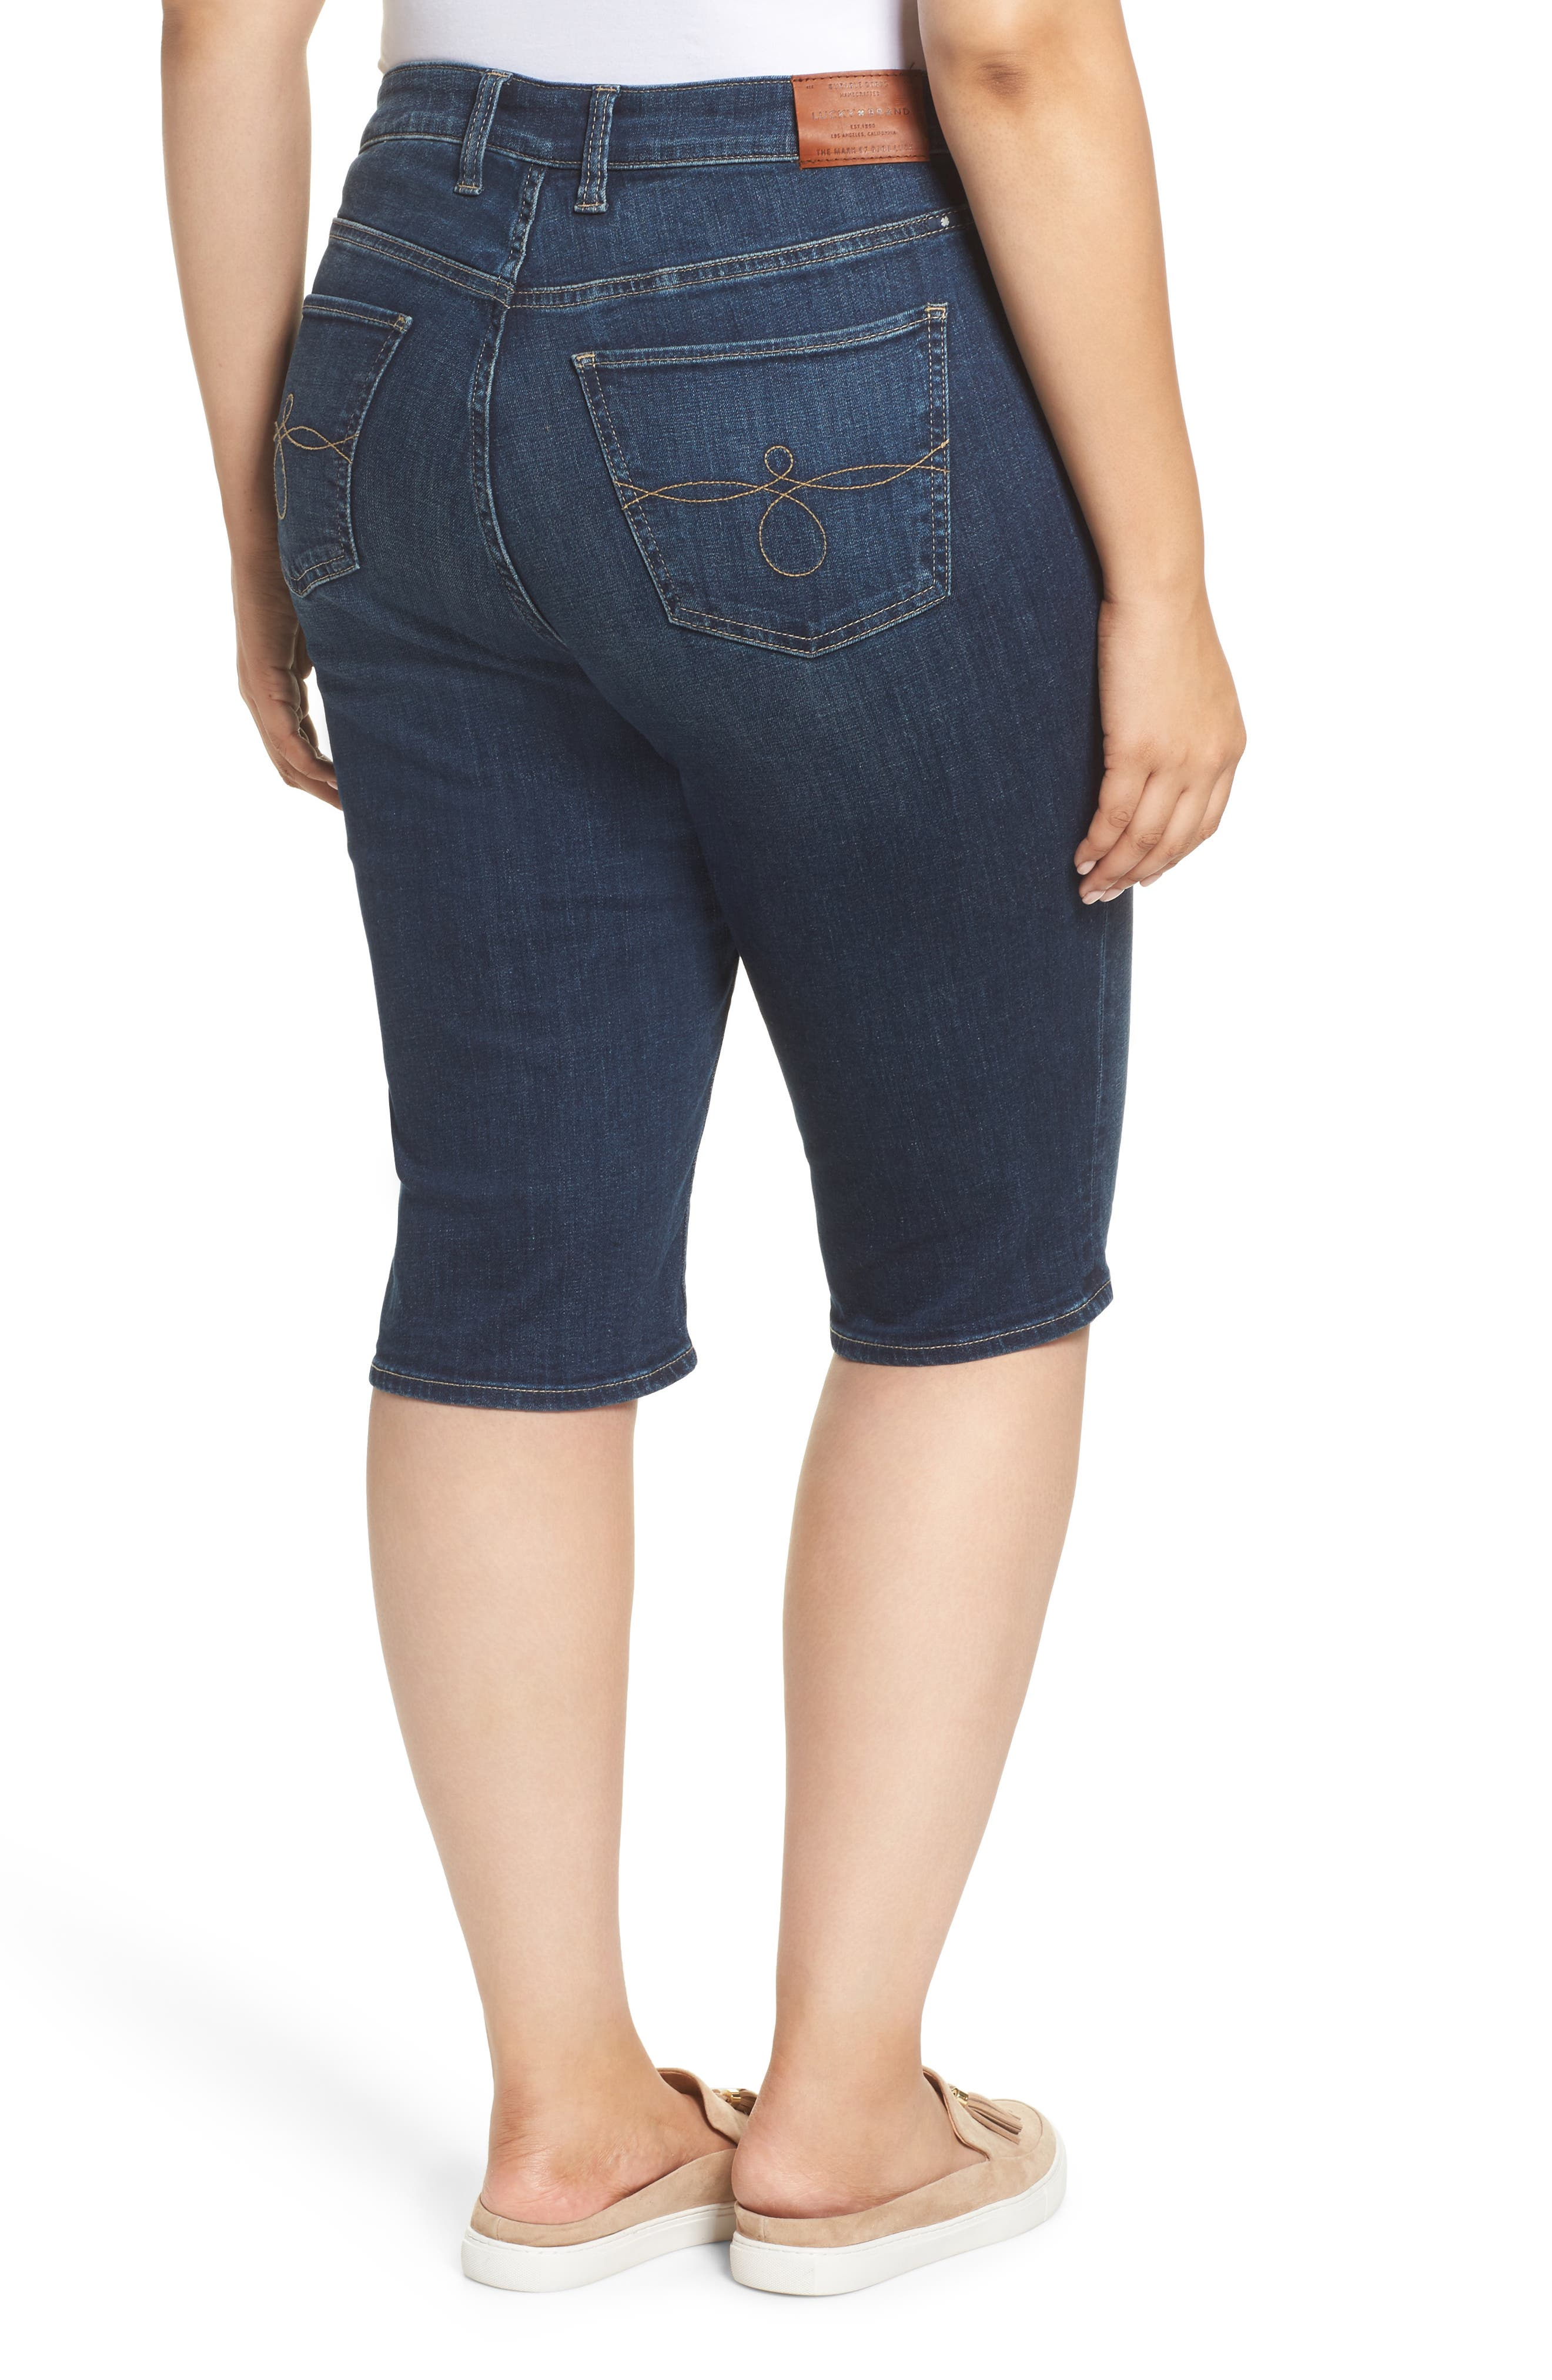 Ginger Bermuda Shorts,                             Alternate thumbnail 2, color,                             Marana-P